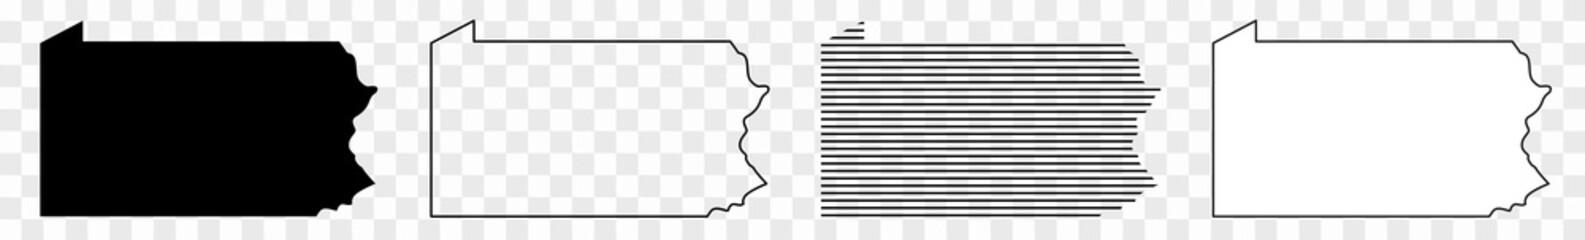 Pennsylvania Map Black | State Border | United States | US America | Transparent Isolated | Variations